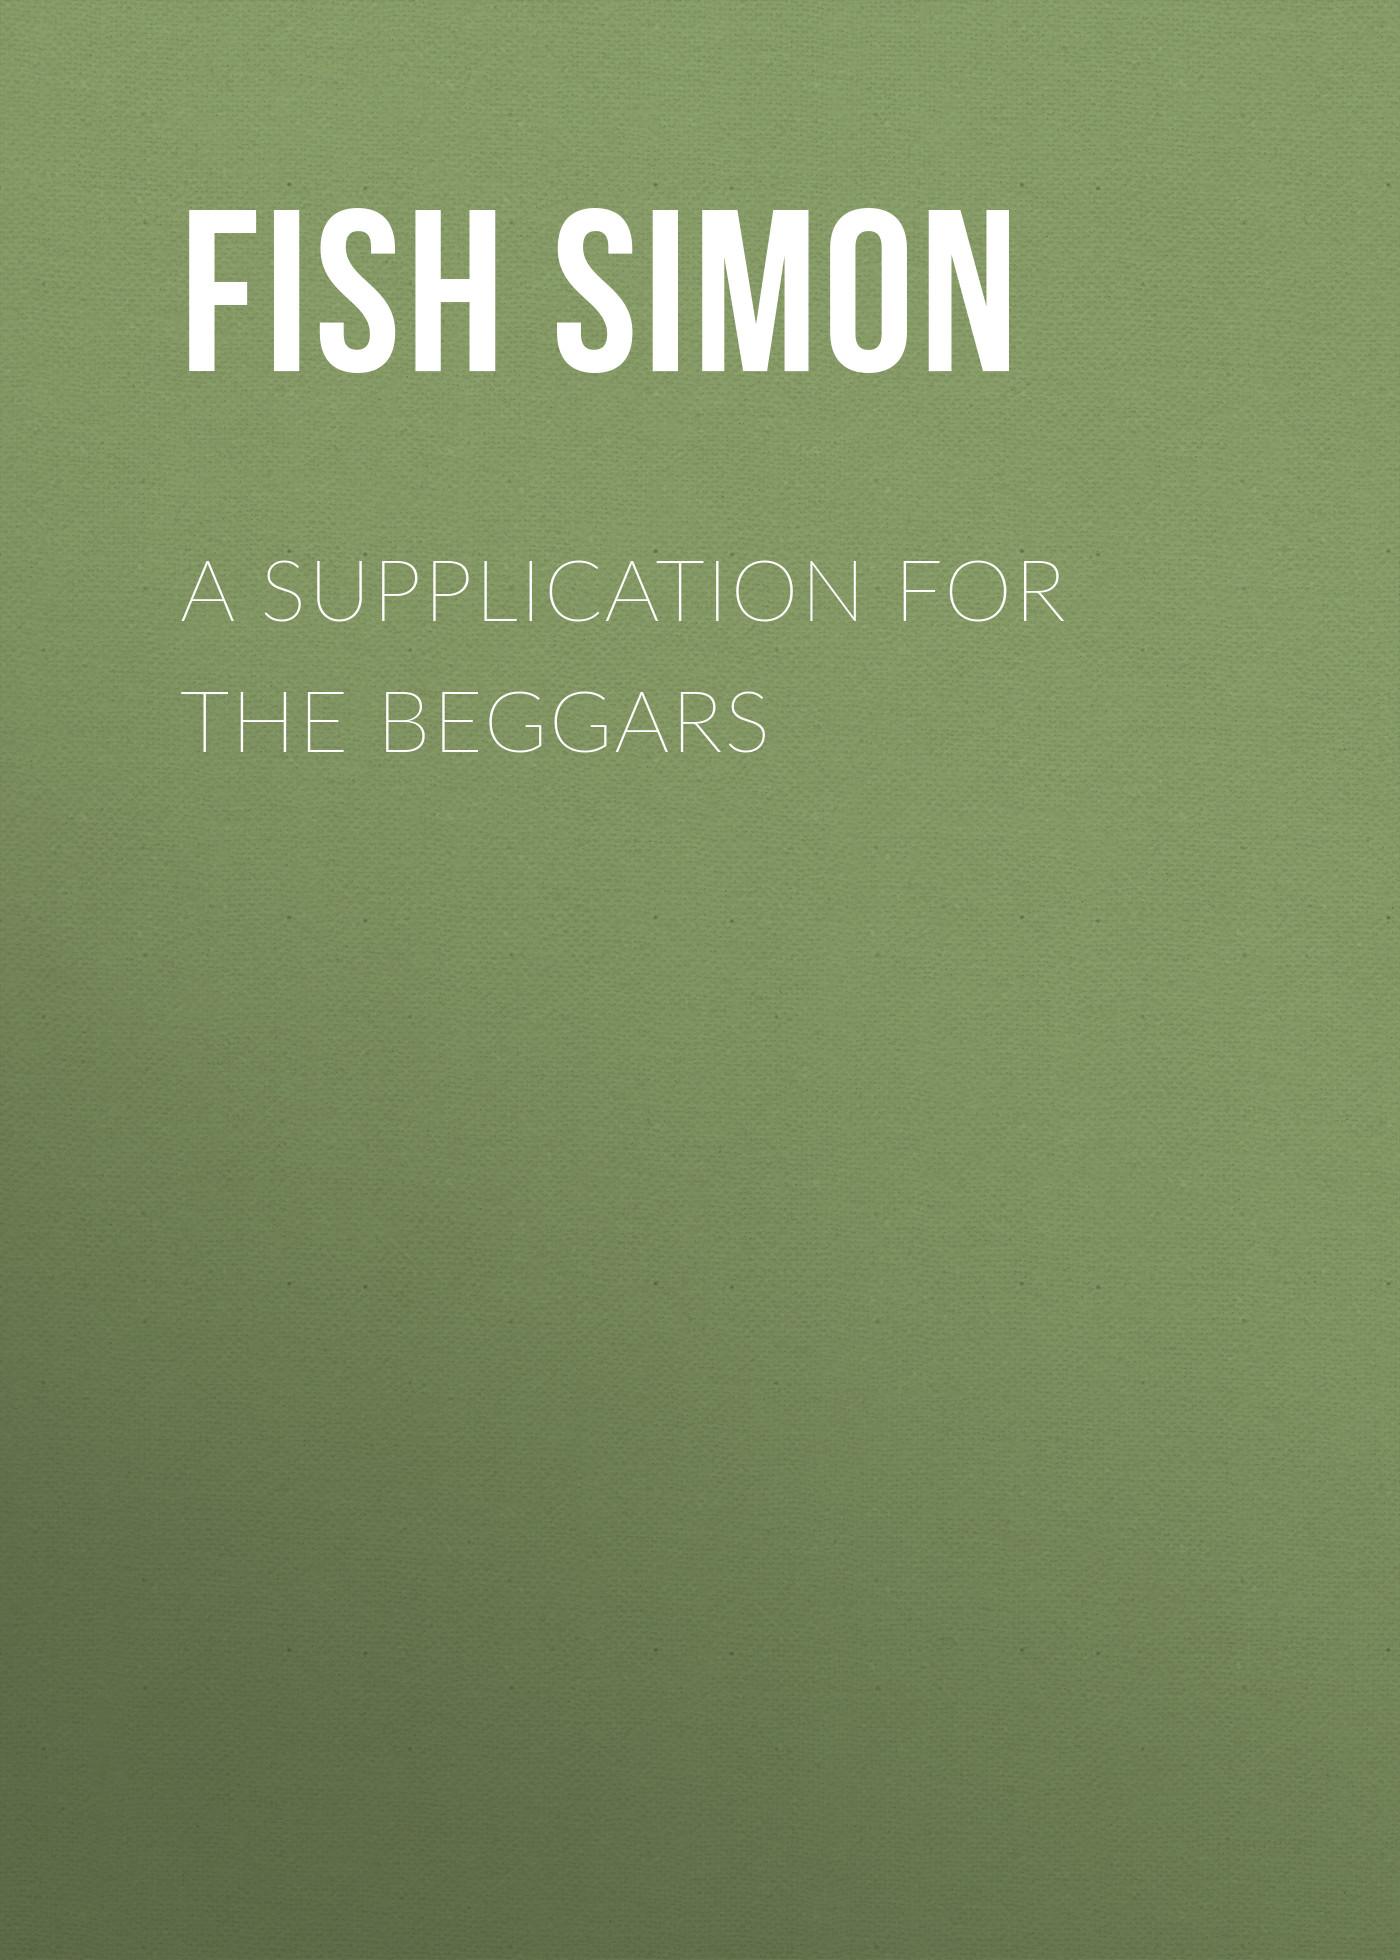 Fish Simon A Supplication for the Beggars r goldbeck supplication